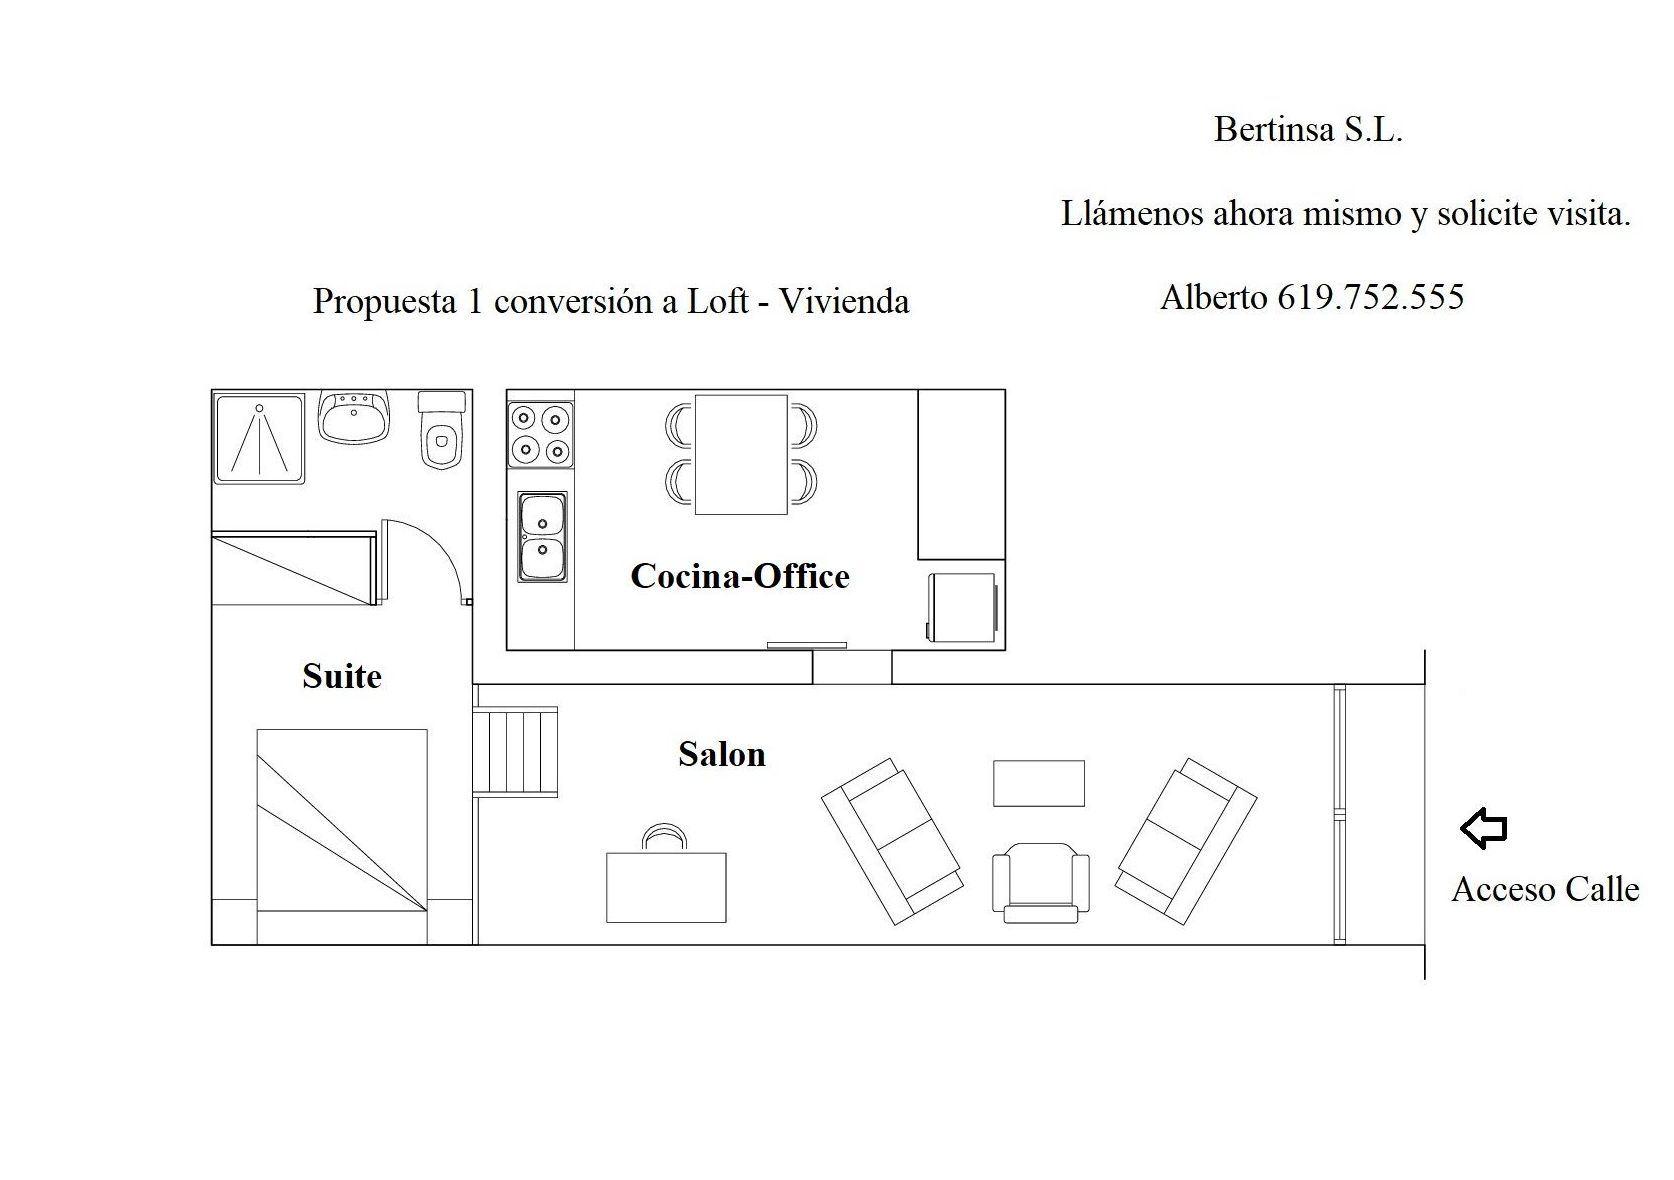 CIUTAT VELLA - Mercat Santa Caterina 135.000€: Visita nuestras inmuebles de Bertinsa Real Estate, Investments & Sale Services